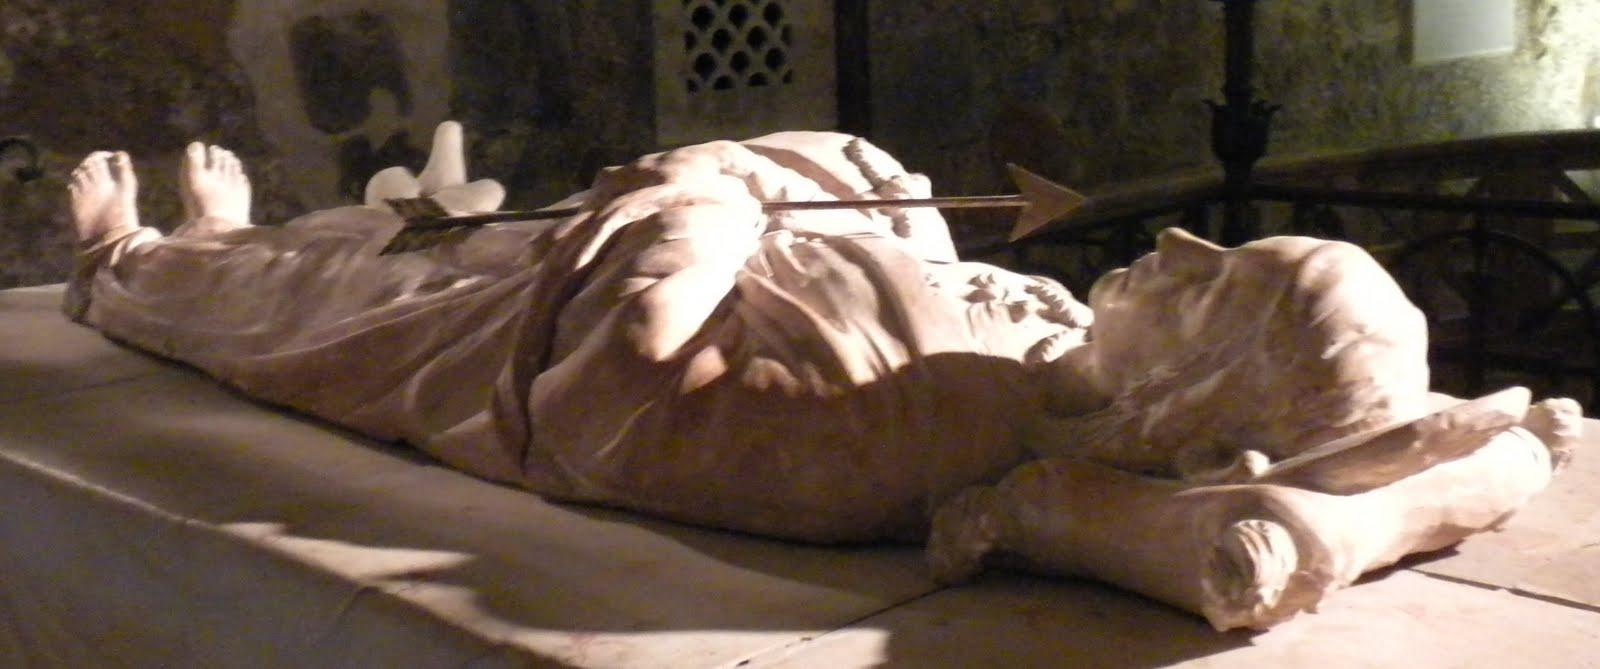 [vf3+cristina+tomb.JPG]